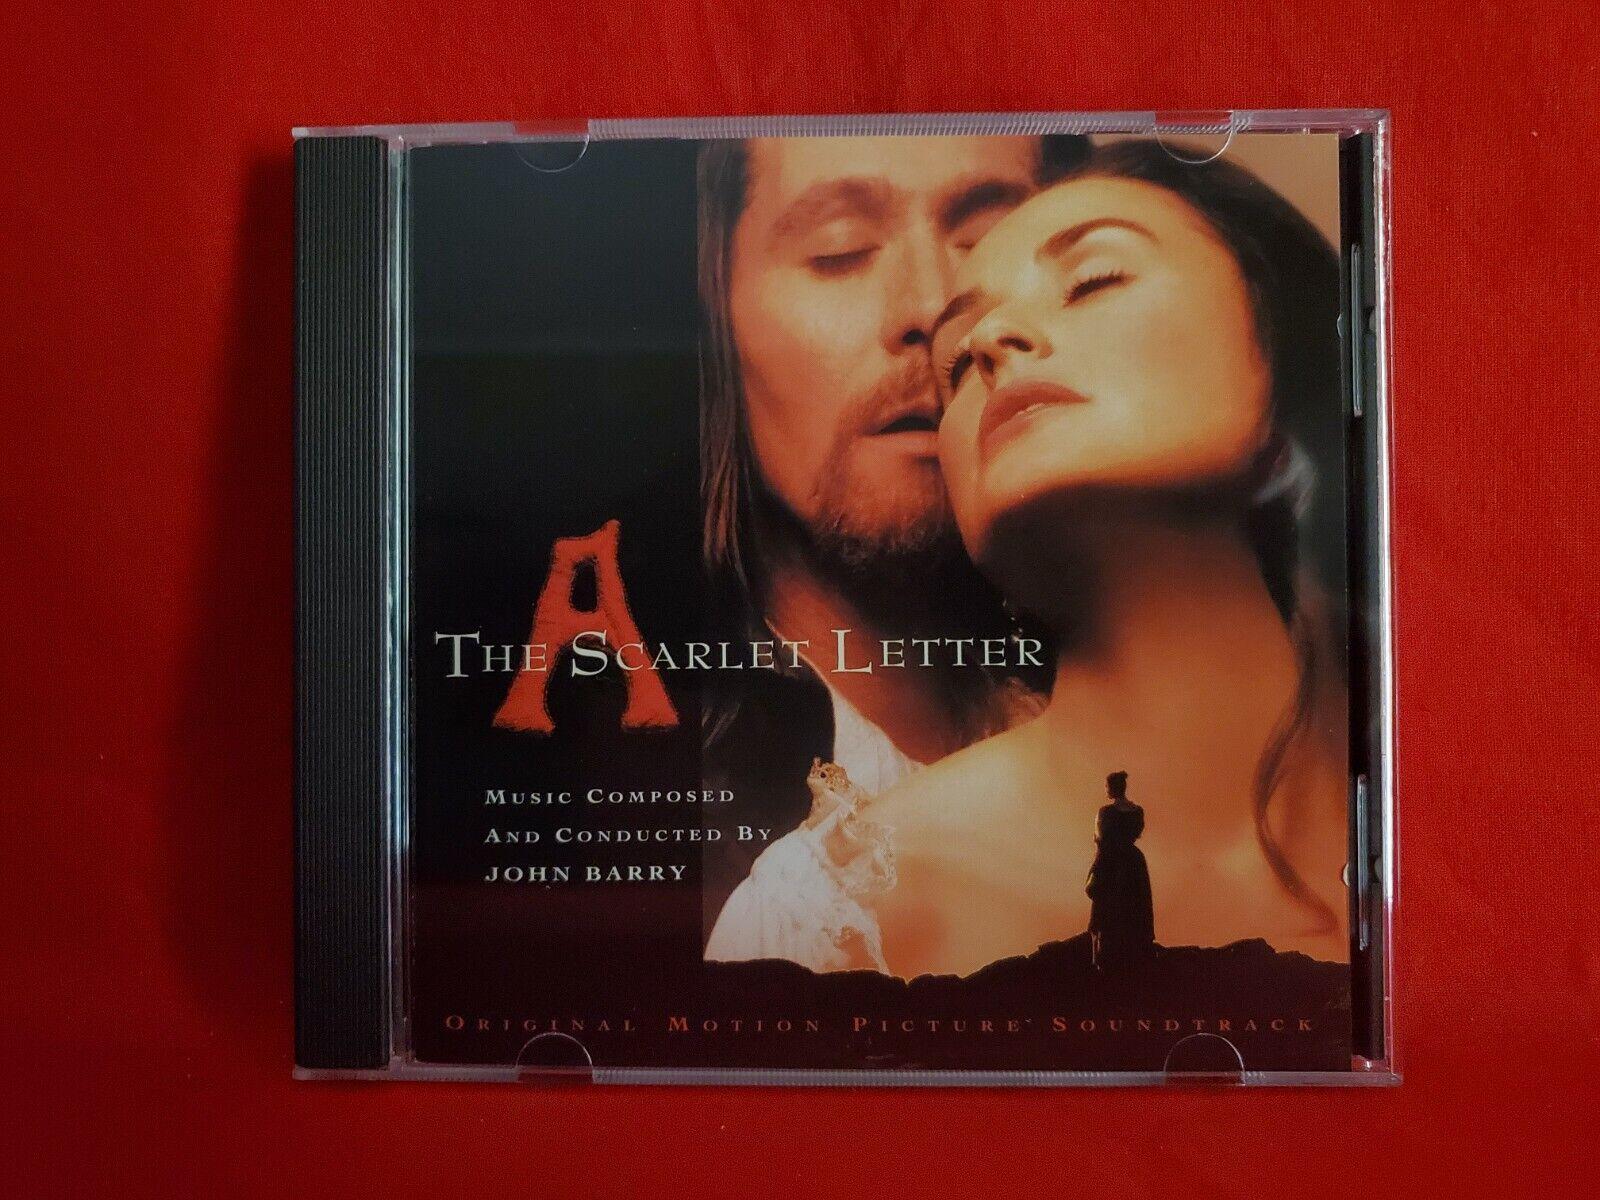 The Scarlet Letter 1995 Epic Soundtrax Soundtrack CD John Barry - $19.98